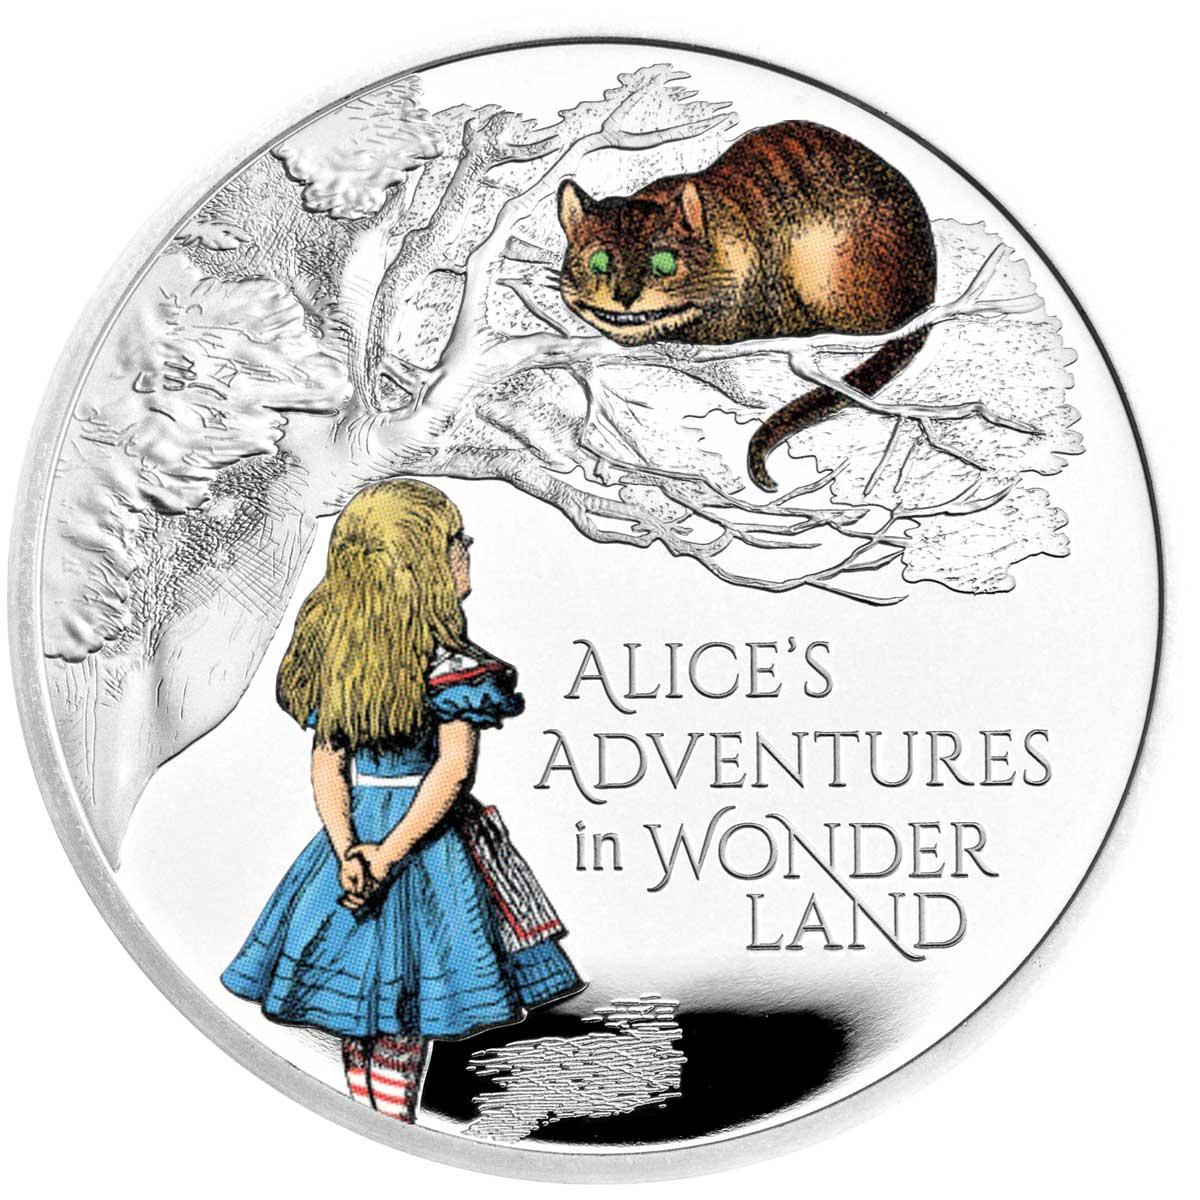 ALICE'S ADVENTURES IN WONDERLAND 2021 United Kingdom 1oz silver proof coin